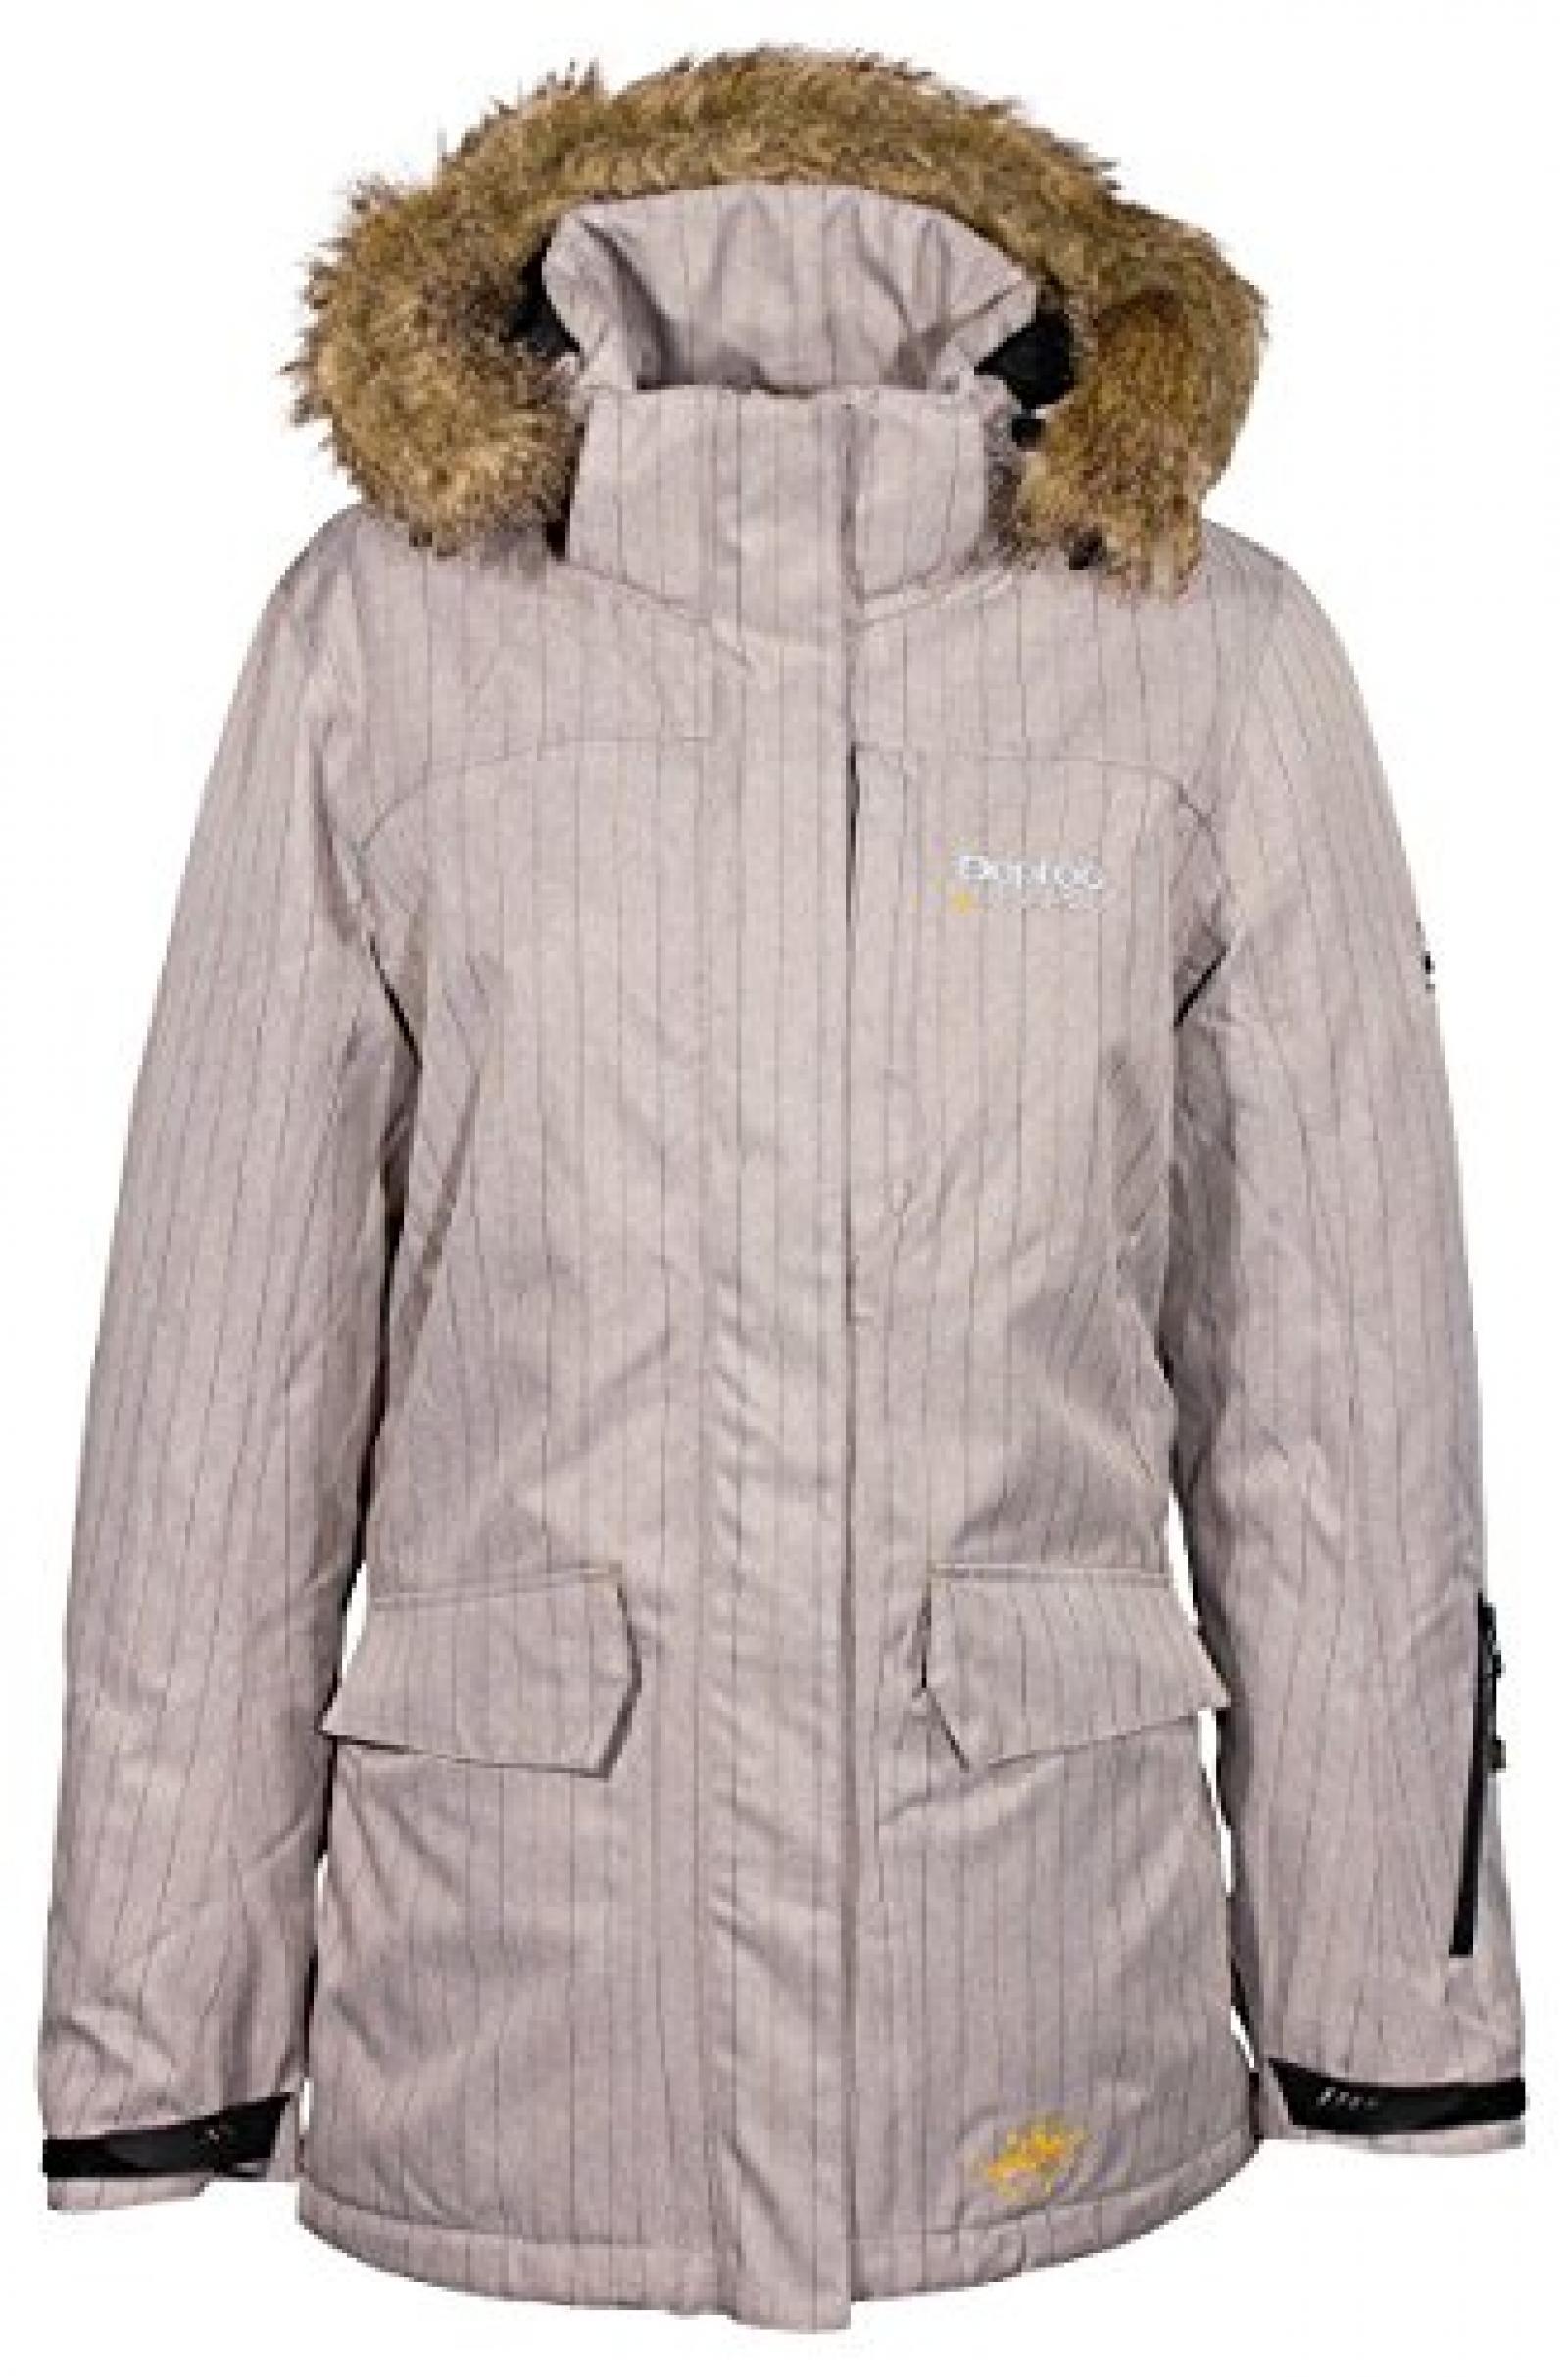 Deproc Cranbrook Ladys Jacke Outdoor Winterjacke Skijacke grau 36-46